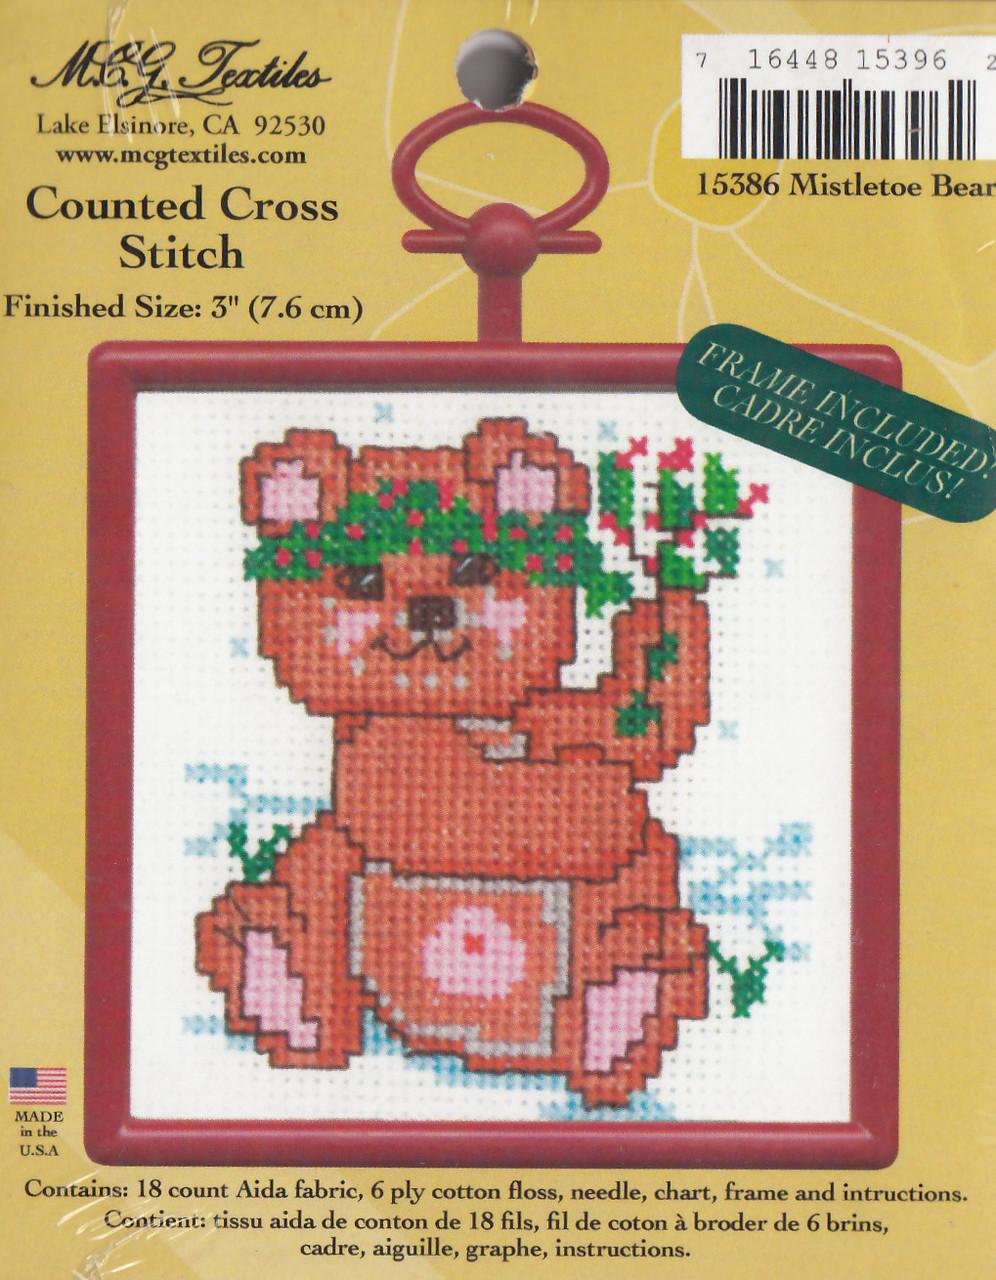 Candamar Mini - Mistletoe Bear